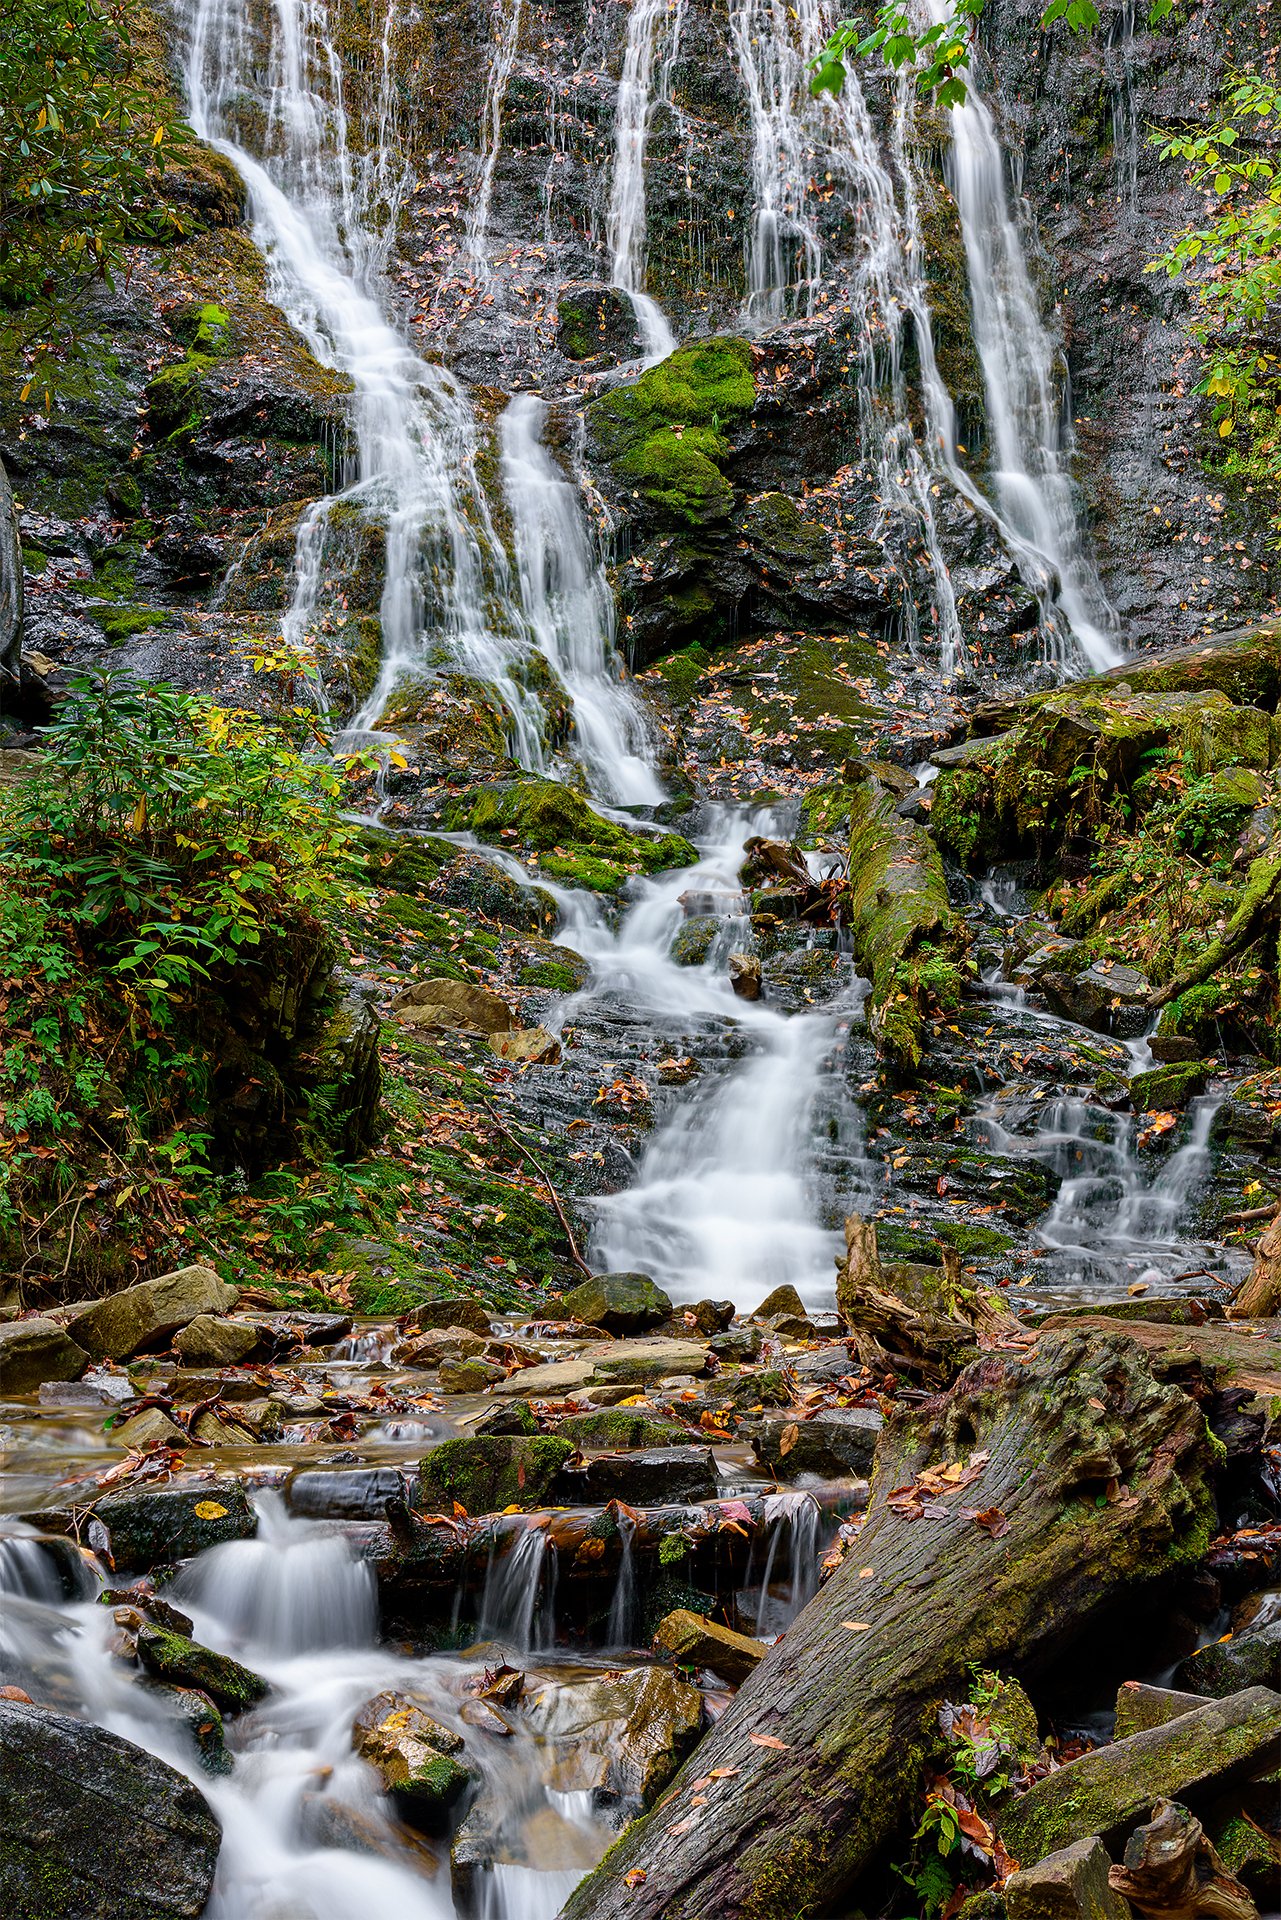 Details of Mingo Falls